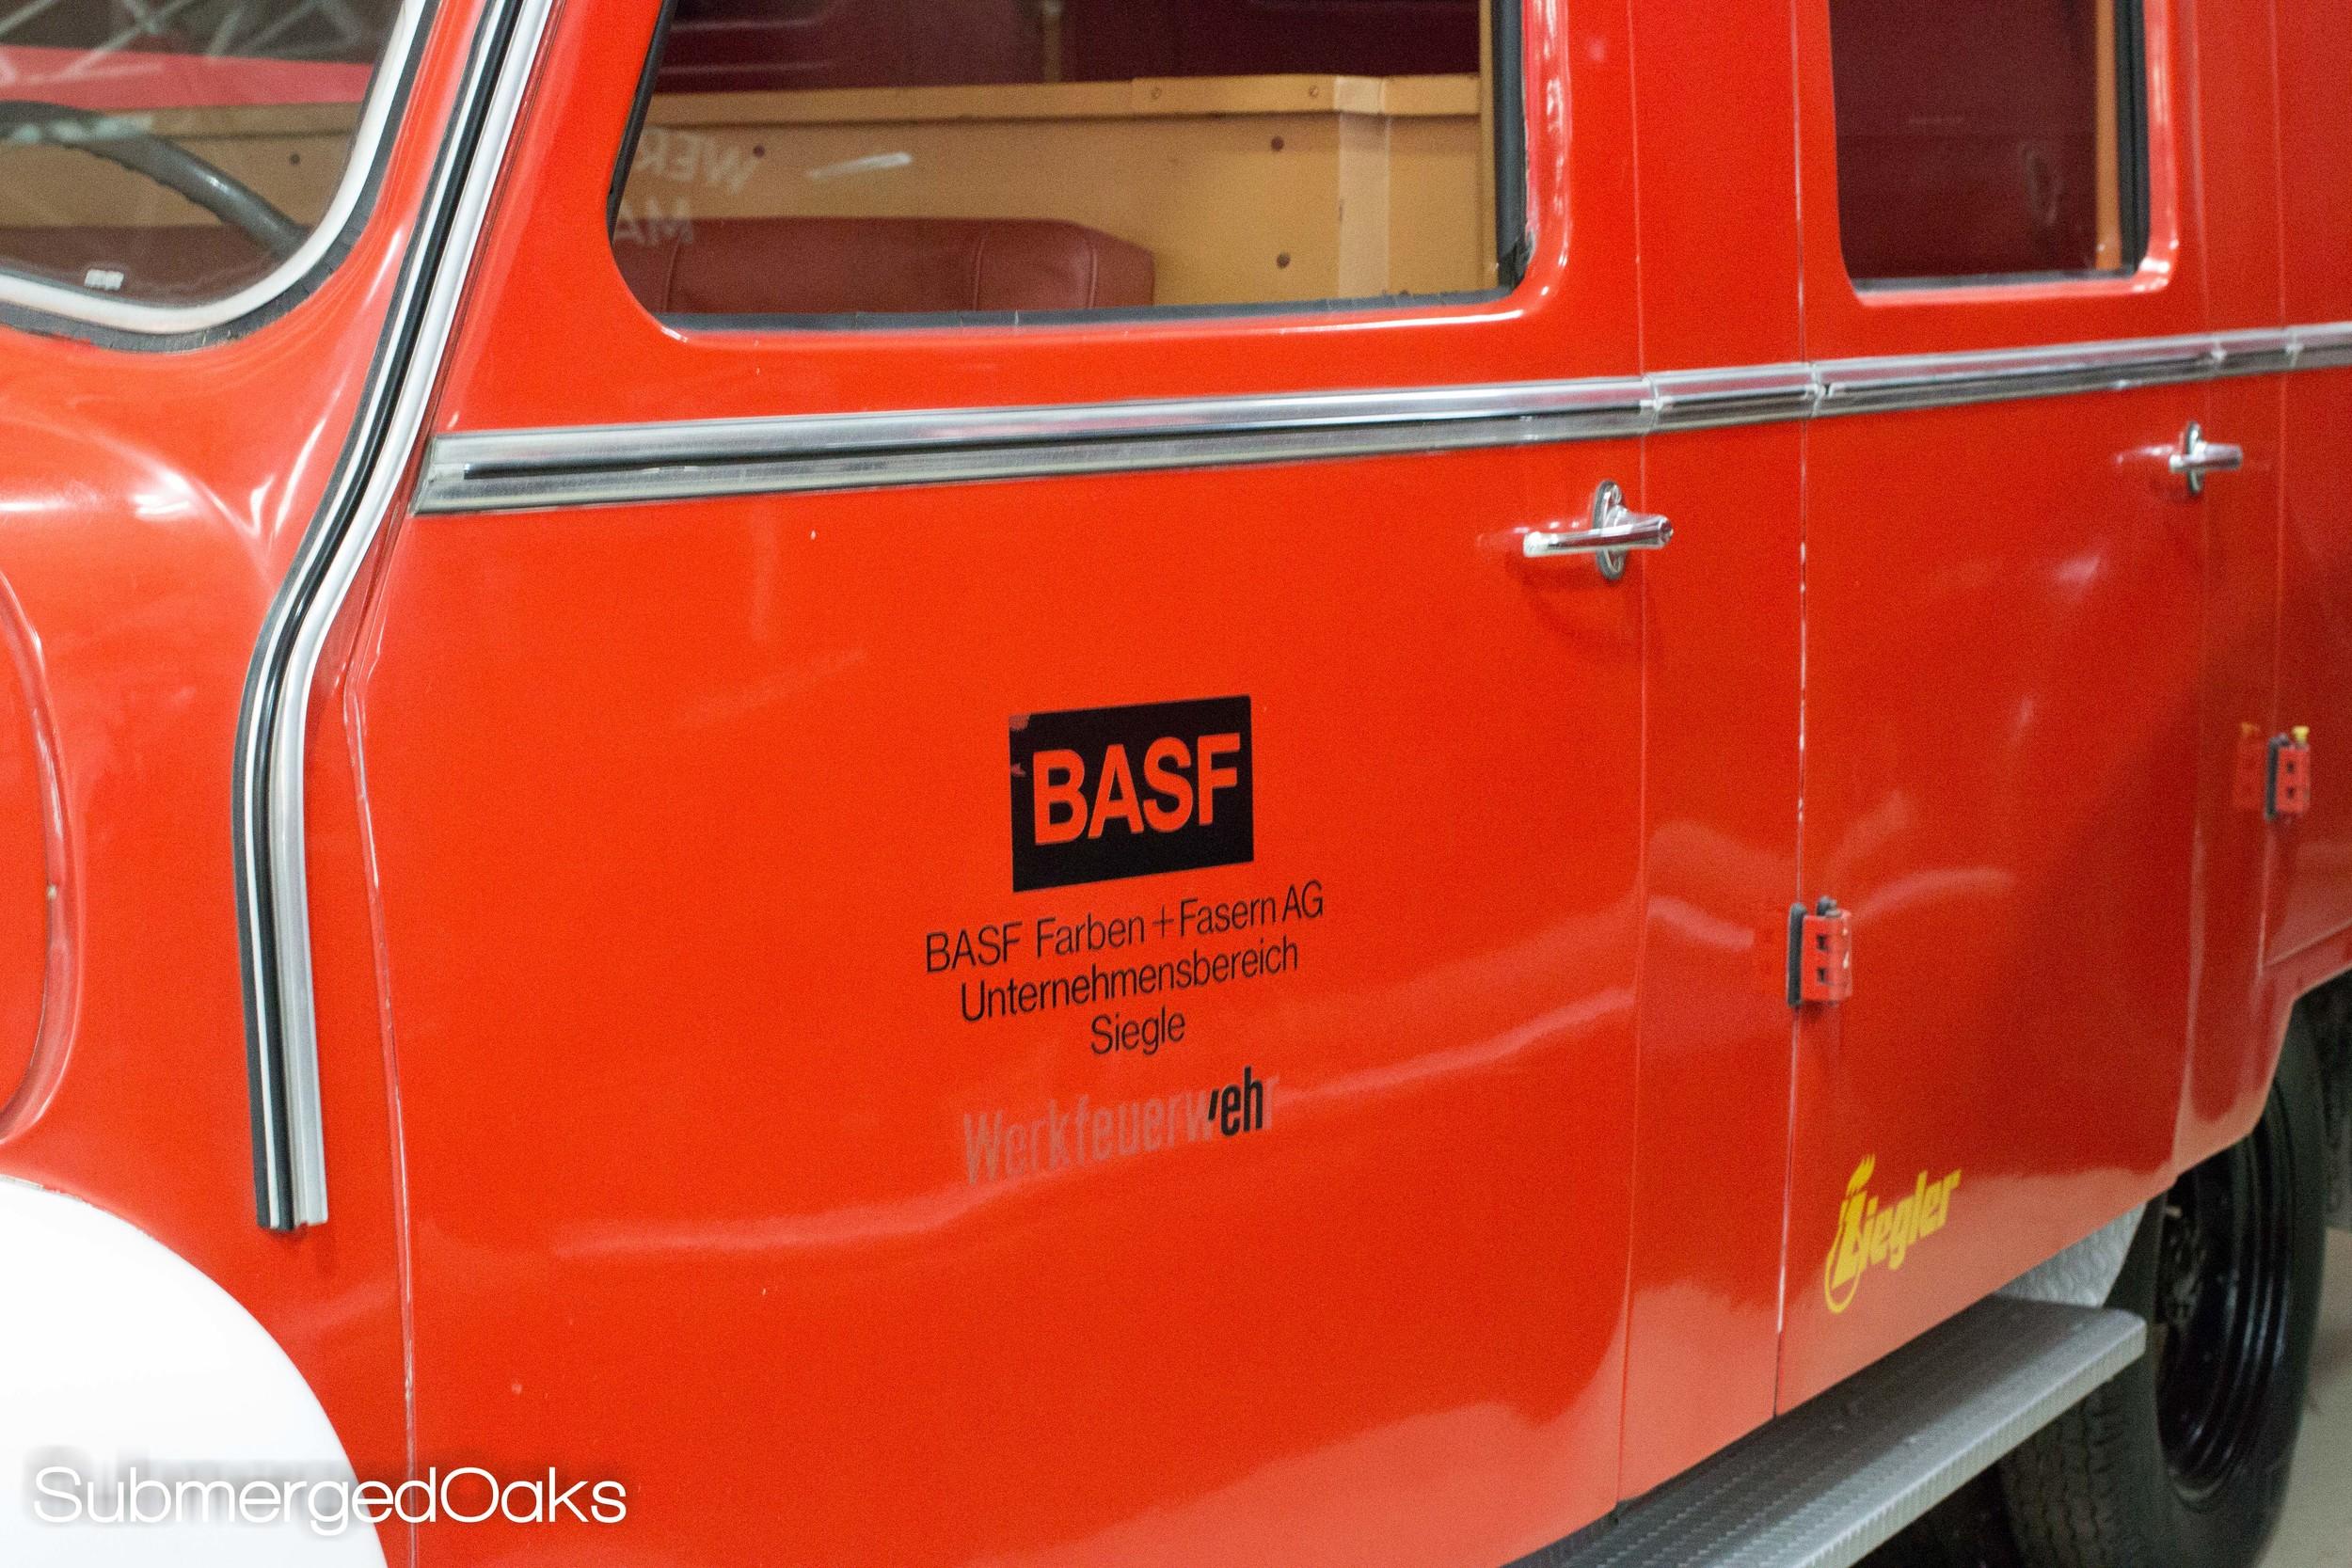 a BASF truck!